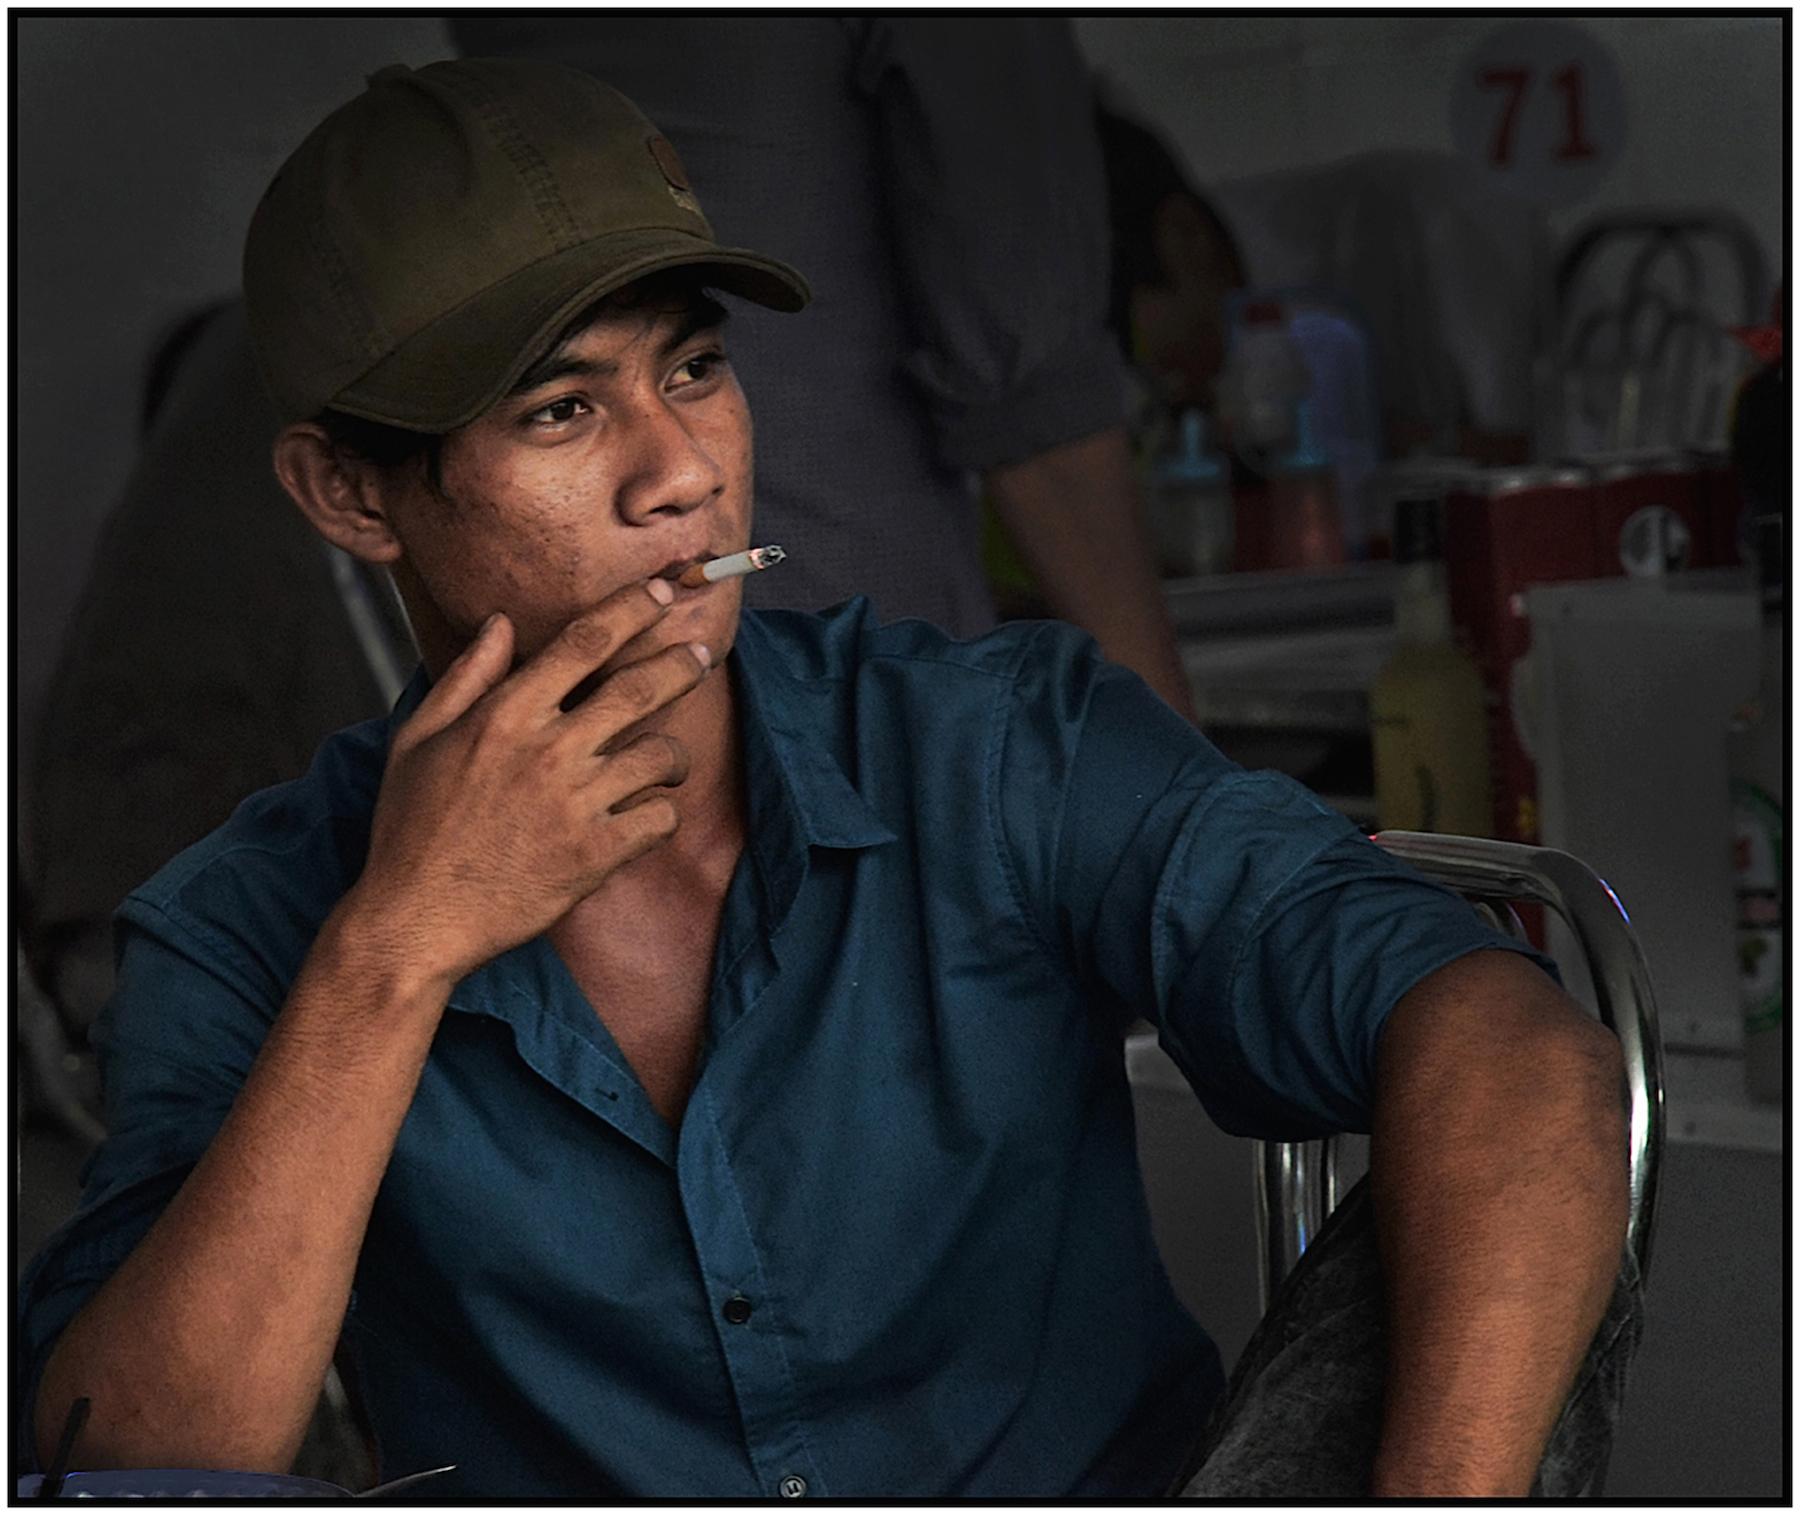 Hung Thang rest stop, Mekong Delta, Jan. 2016 #9846